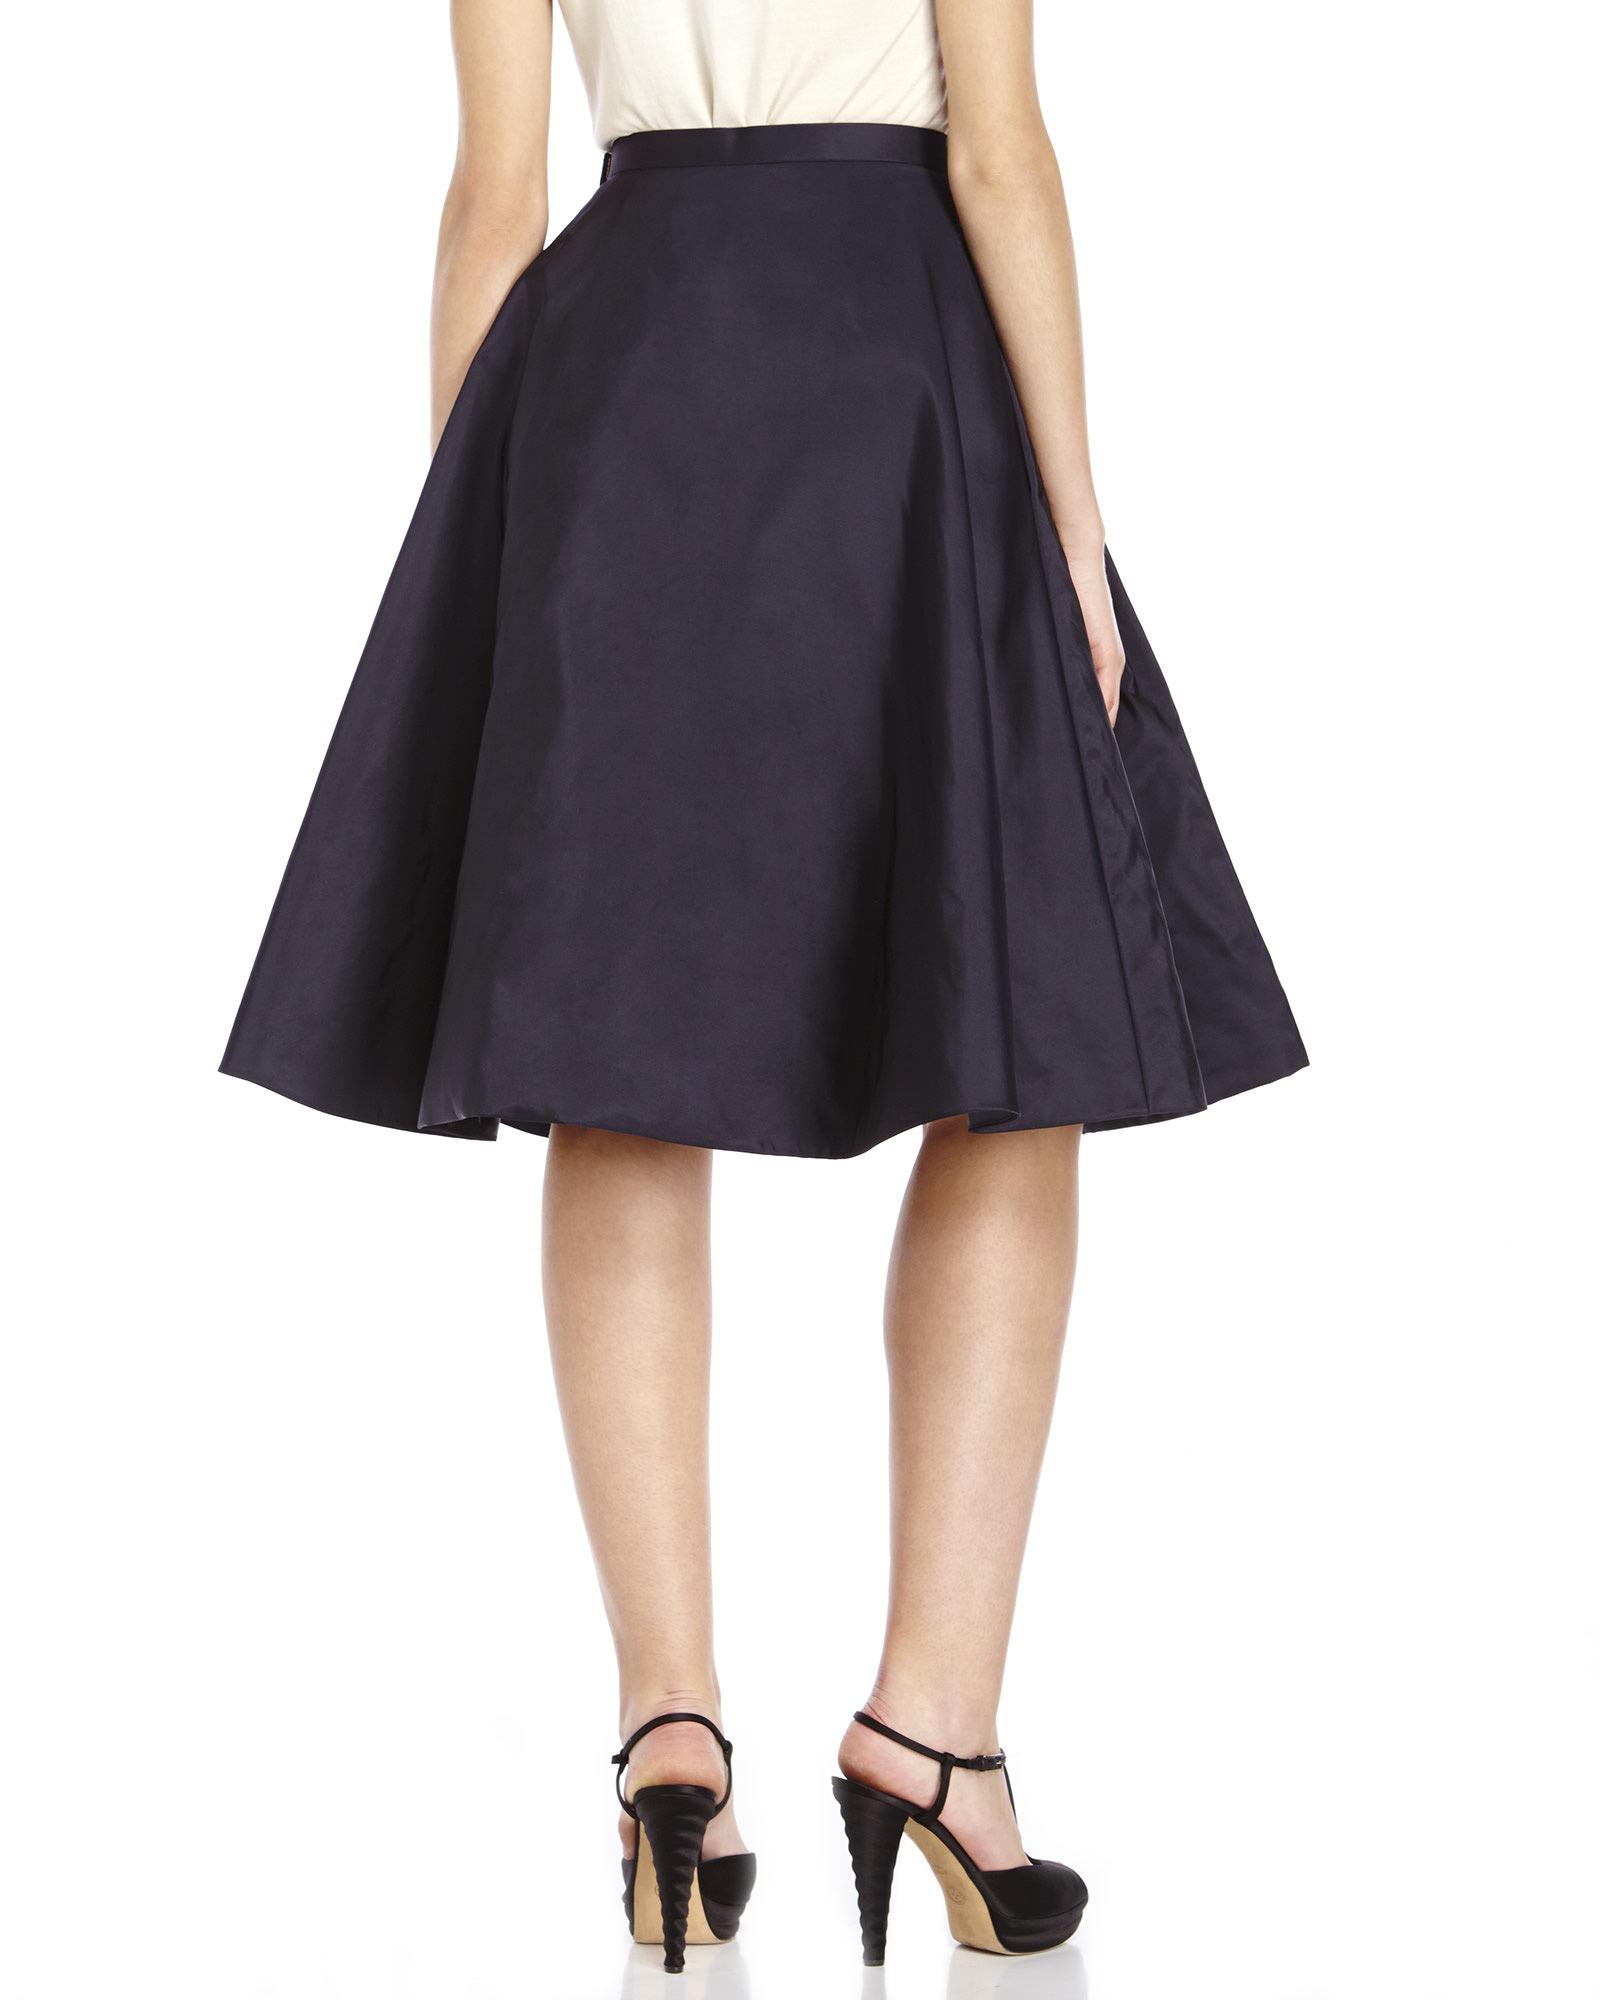 Jason wu Navy Pleated A-Line Silk Skirt in Blue | Lyst